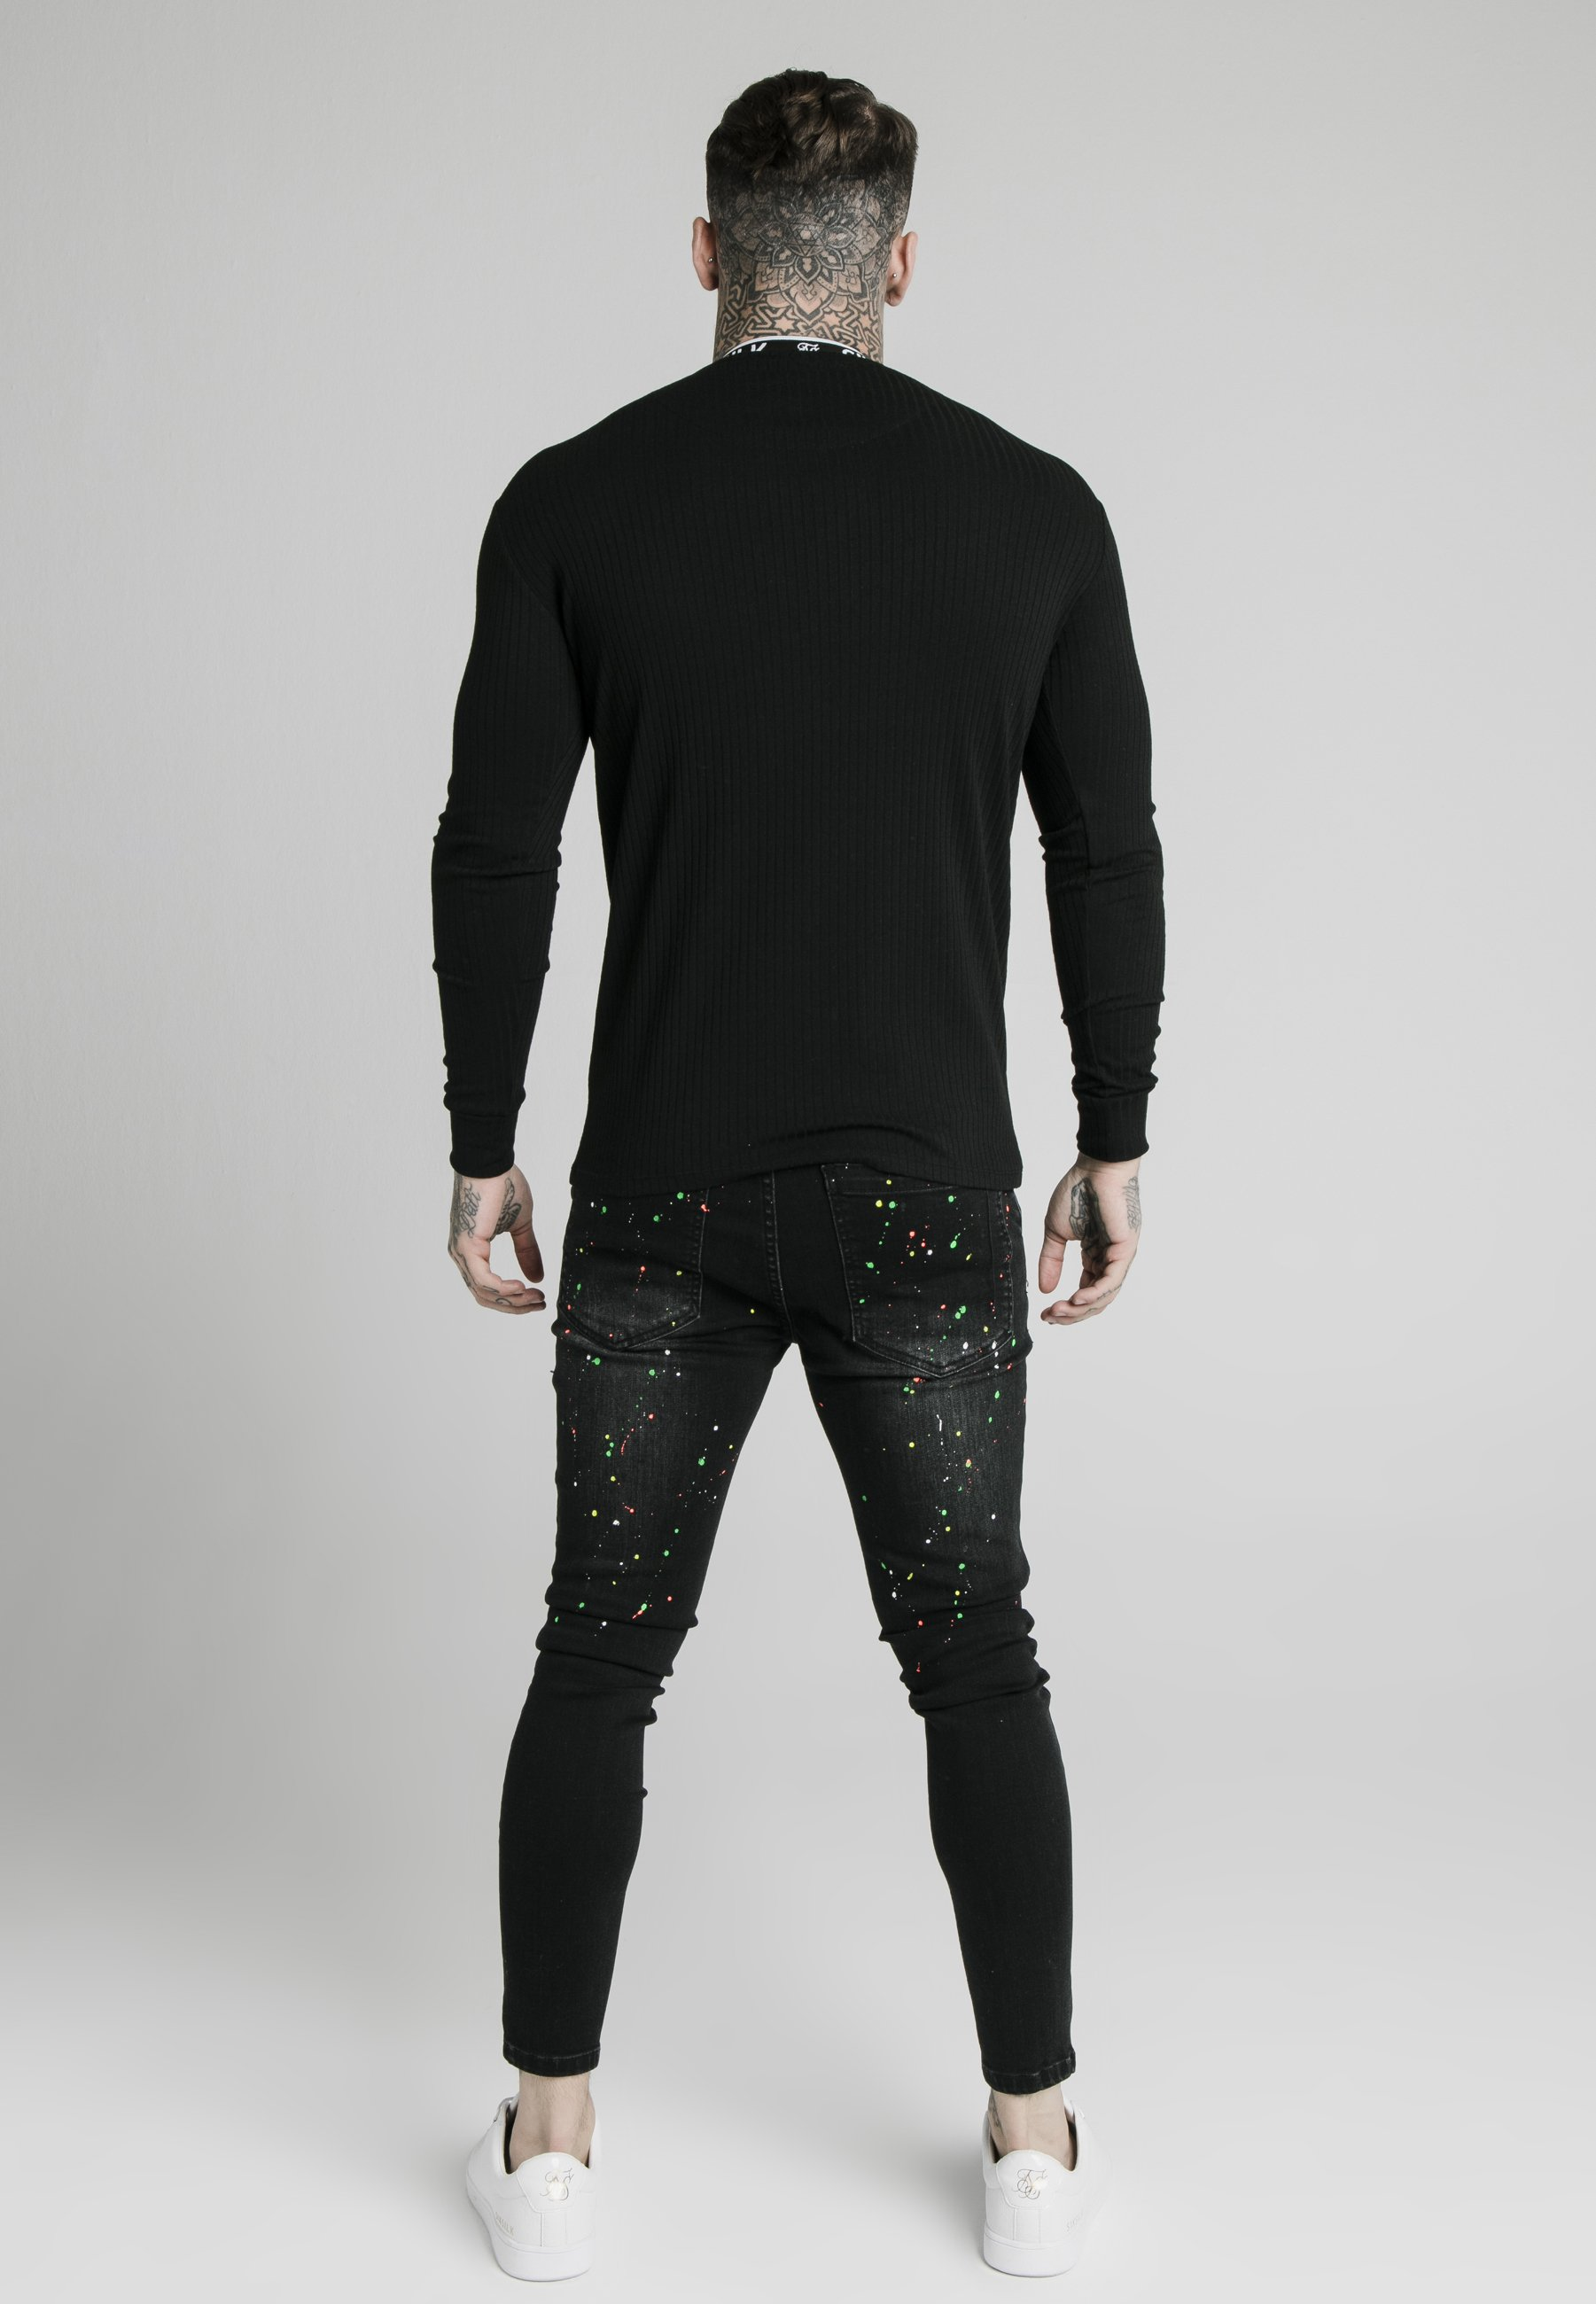 Siksilk Rib Knit Tee - Topper Langermet Black/svart